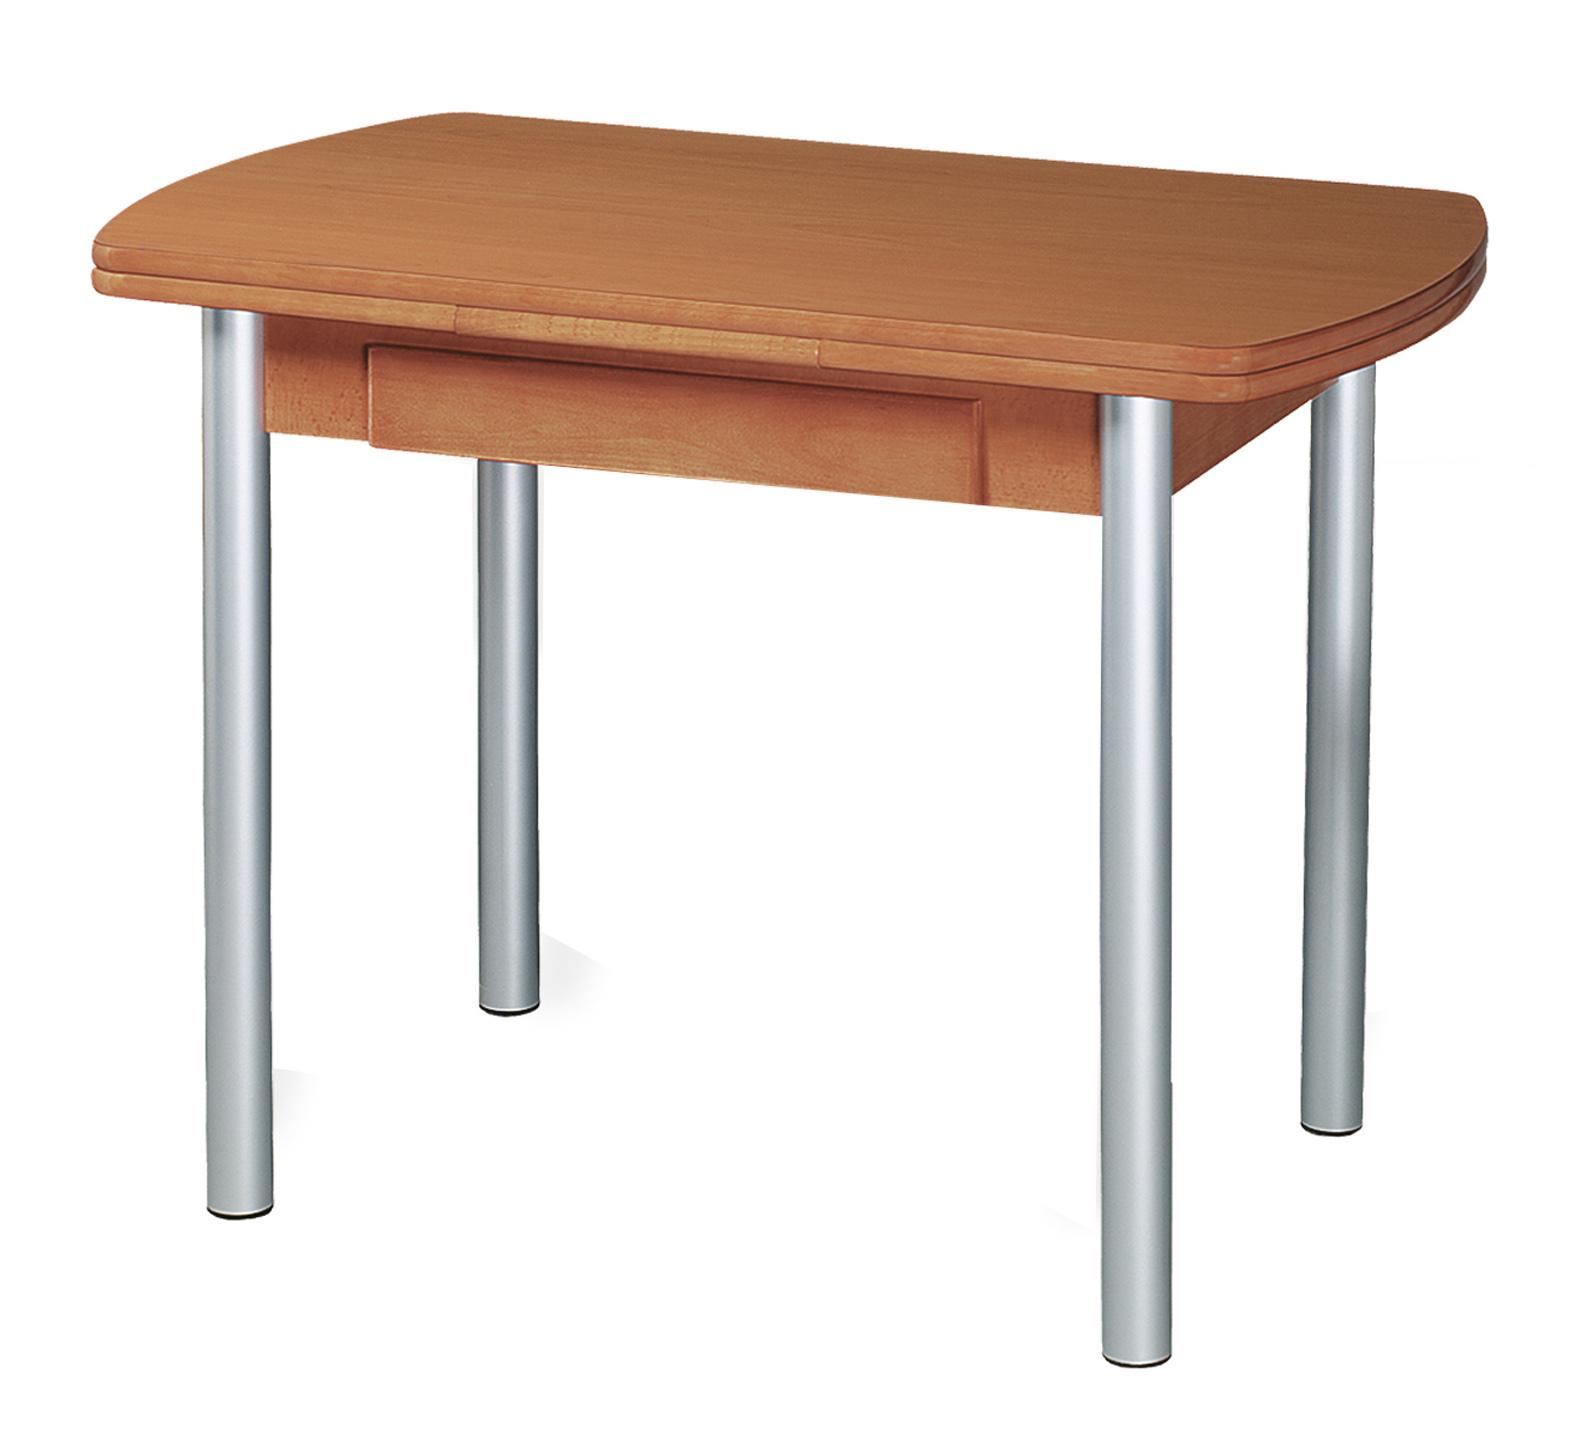 mesa cocina oval 100 decora descans complementos mueble